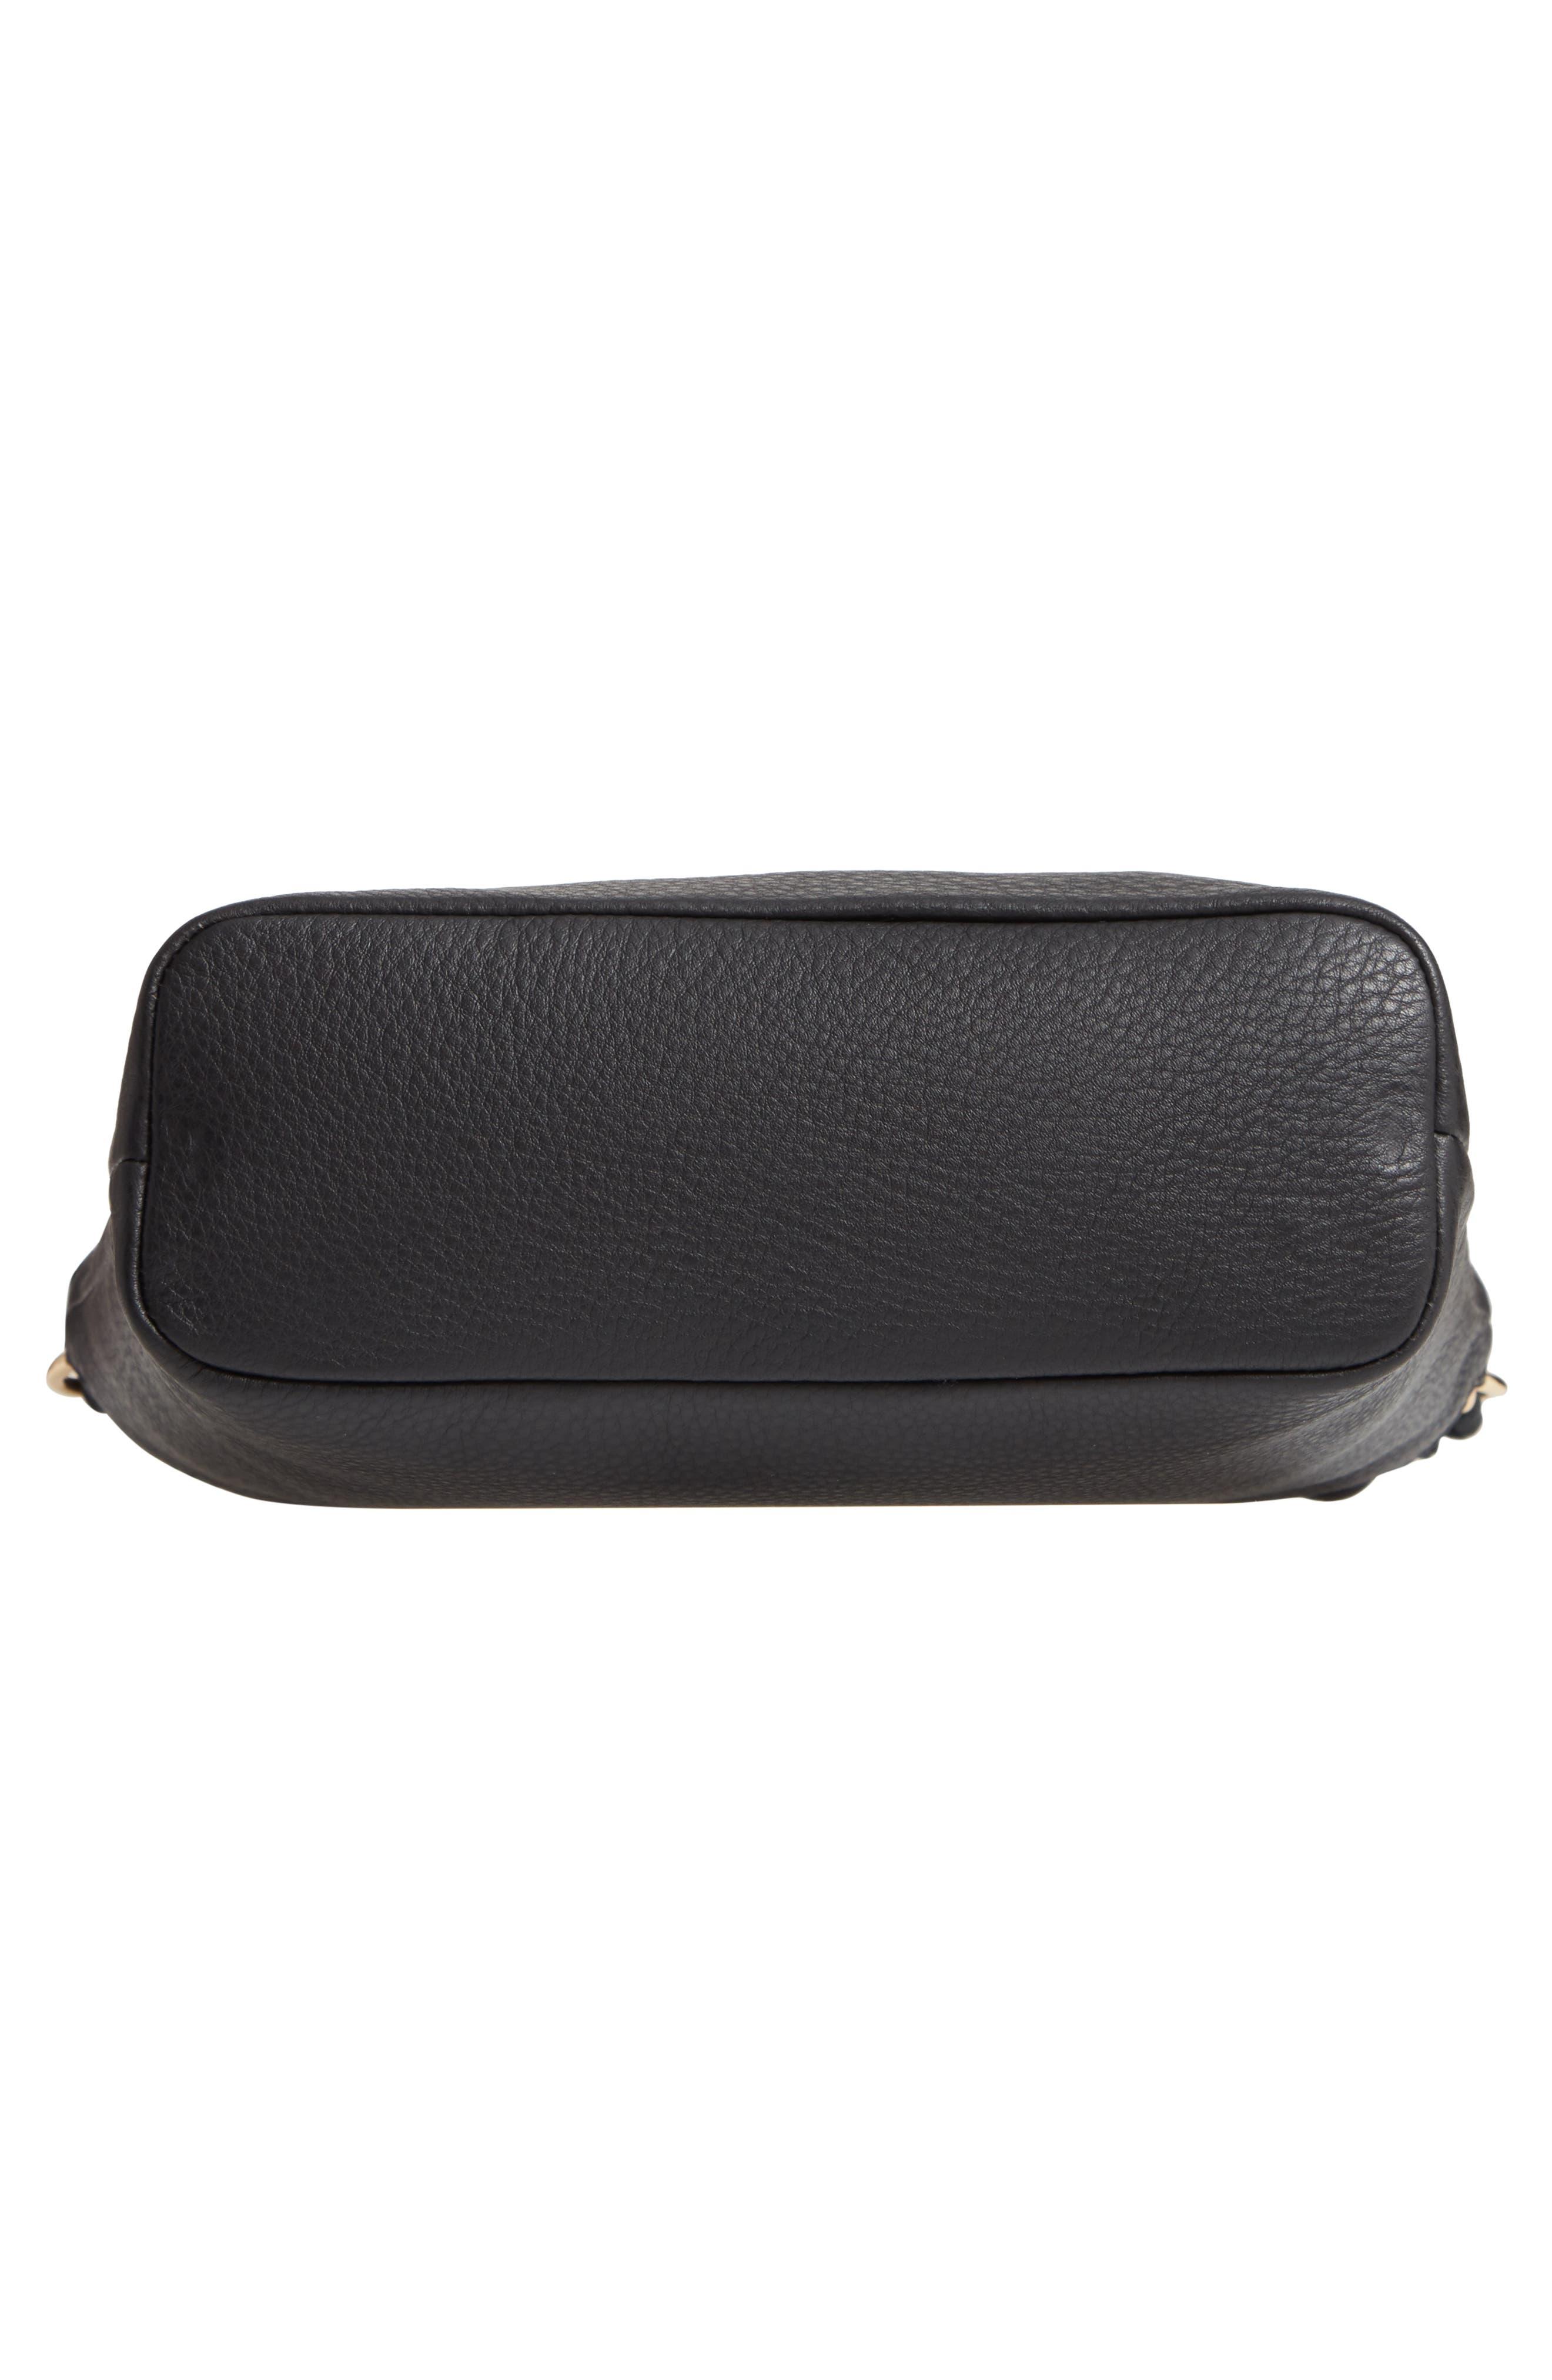 VINCE CAMUTO, Wavy Leather Bucket Bag, Alternate thumbnail 7, color, BLACK